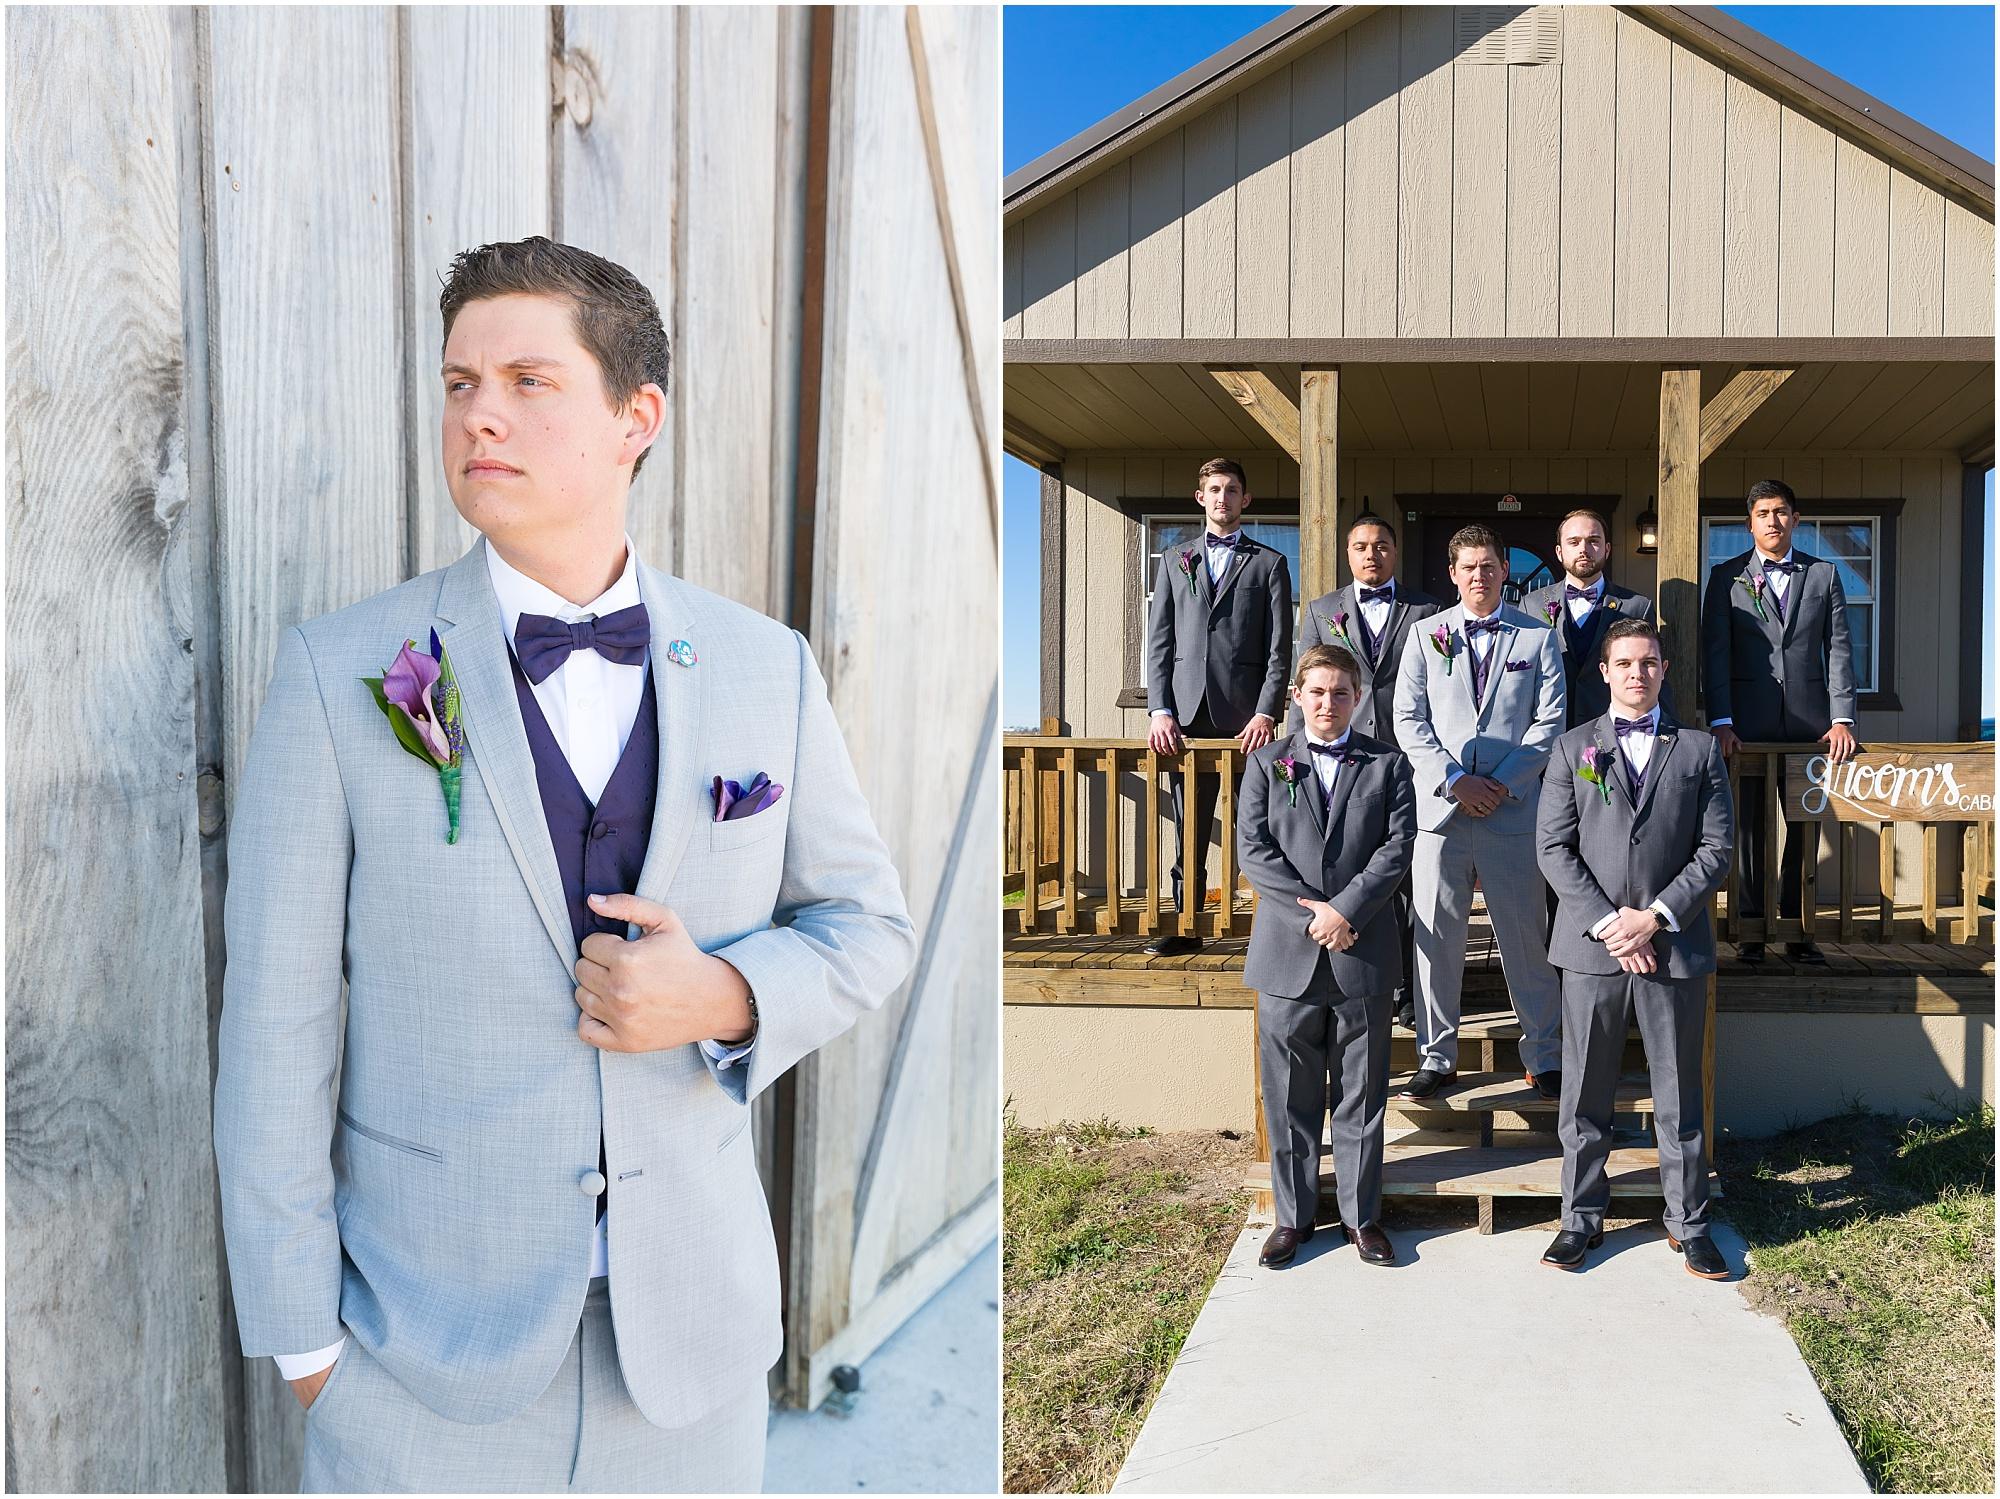 Disney-Inspired-Wedding-Central-Texas_0025.jpg